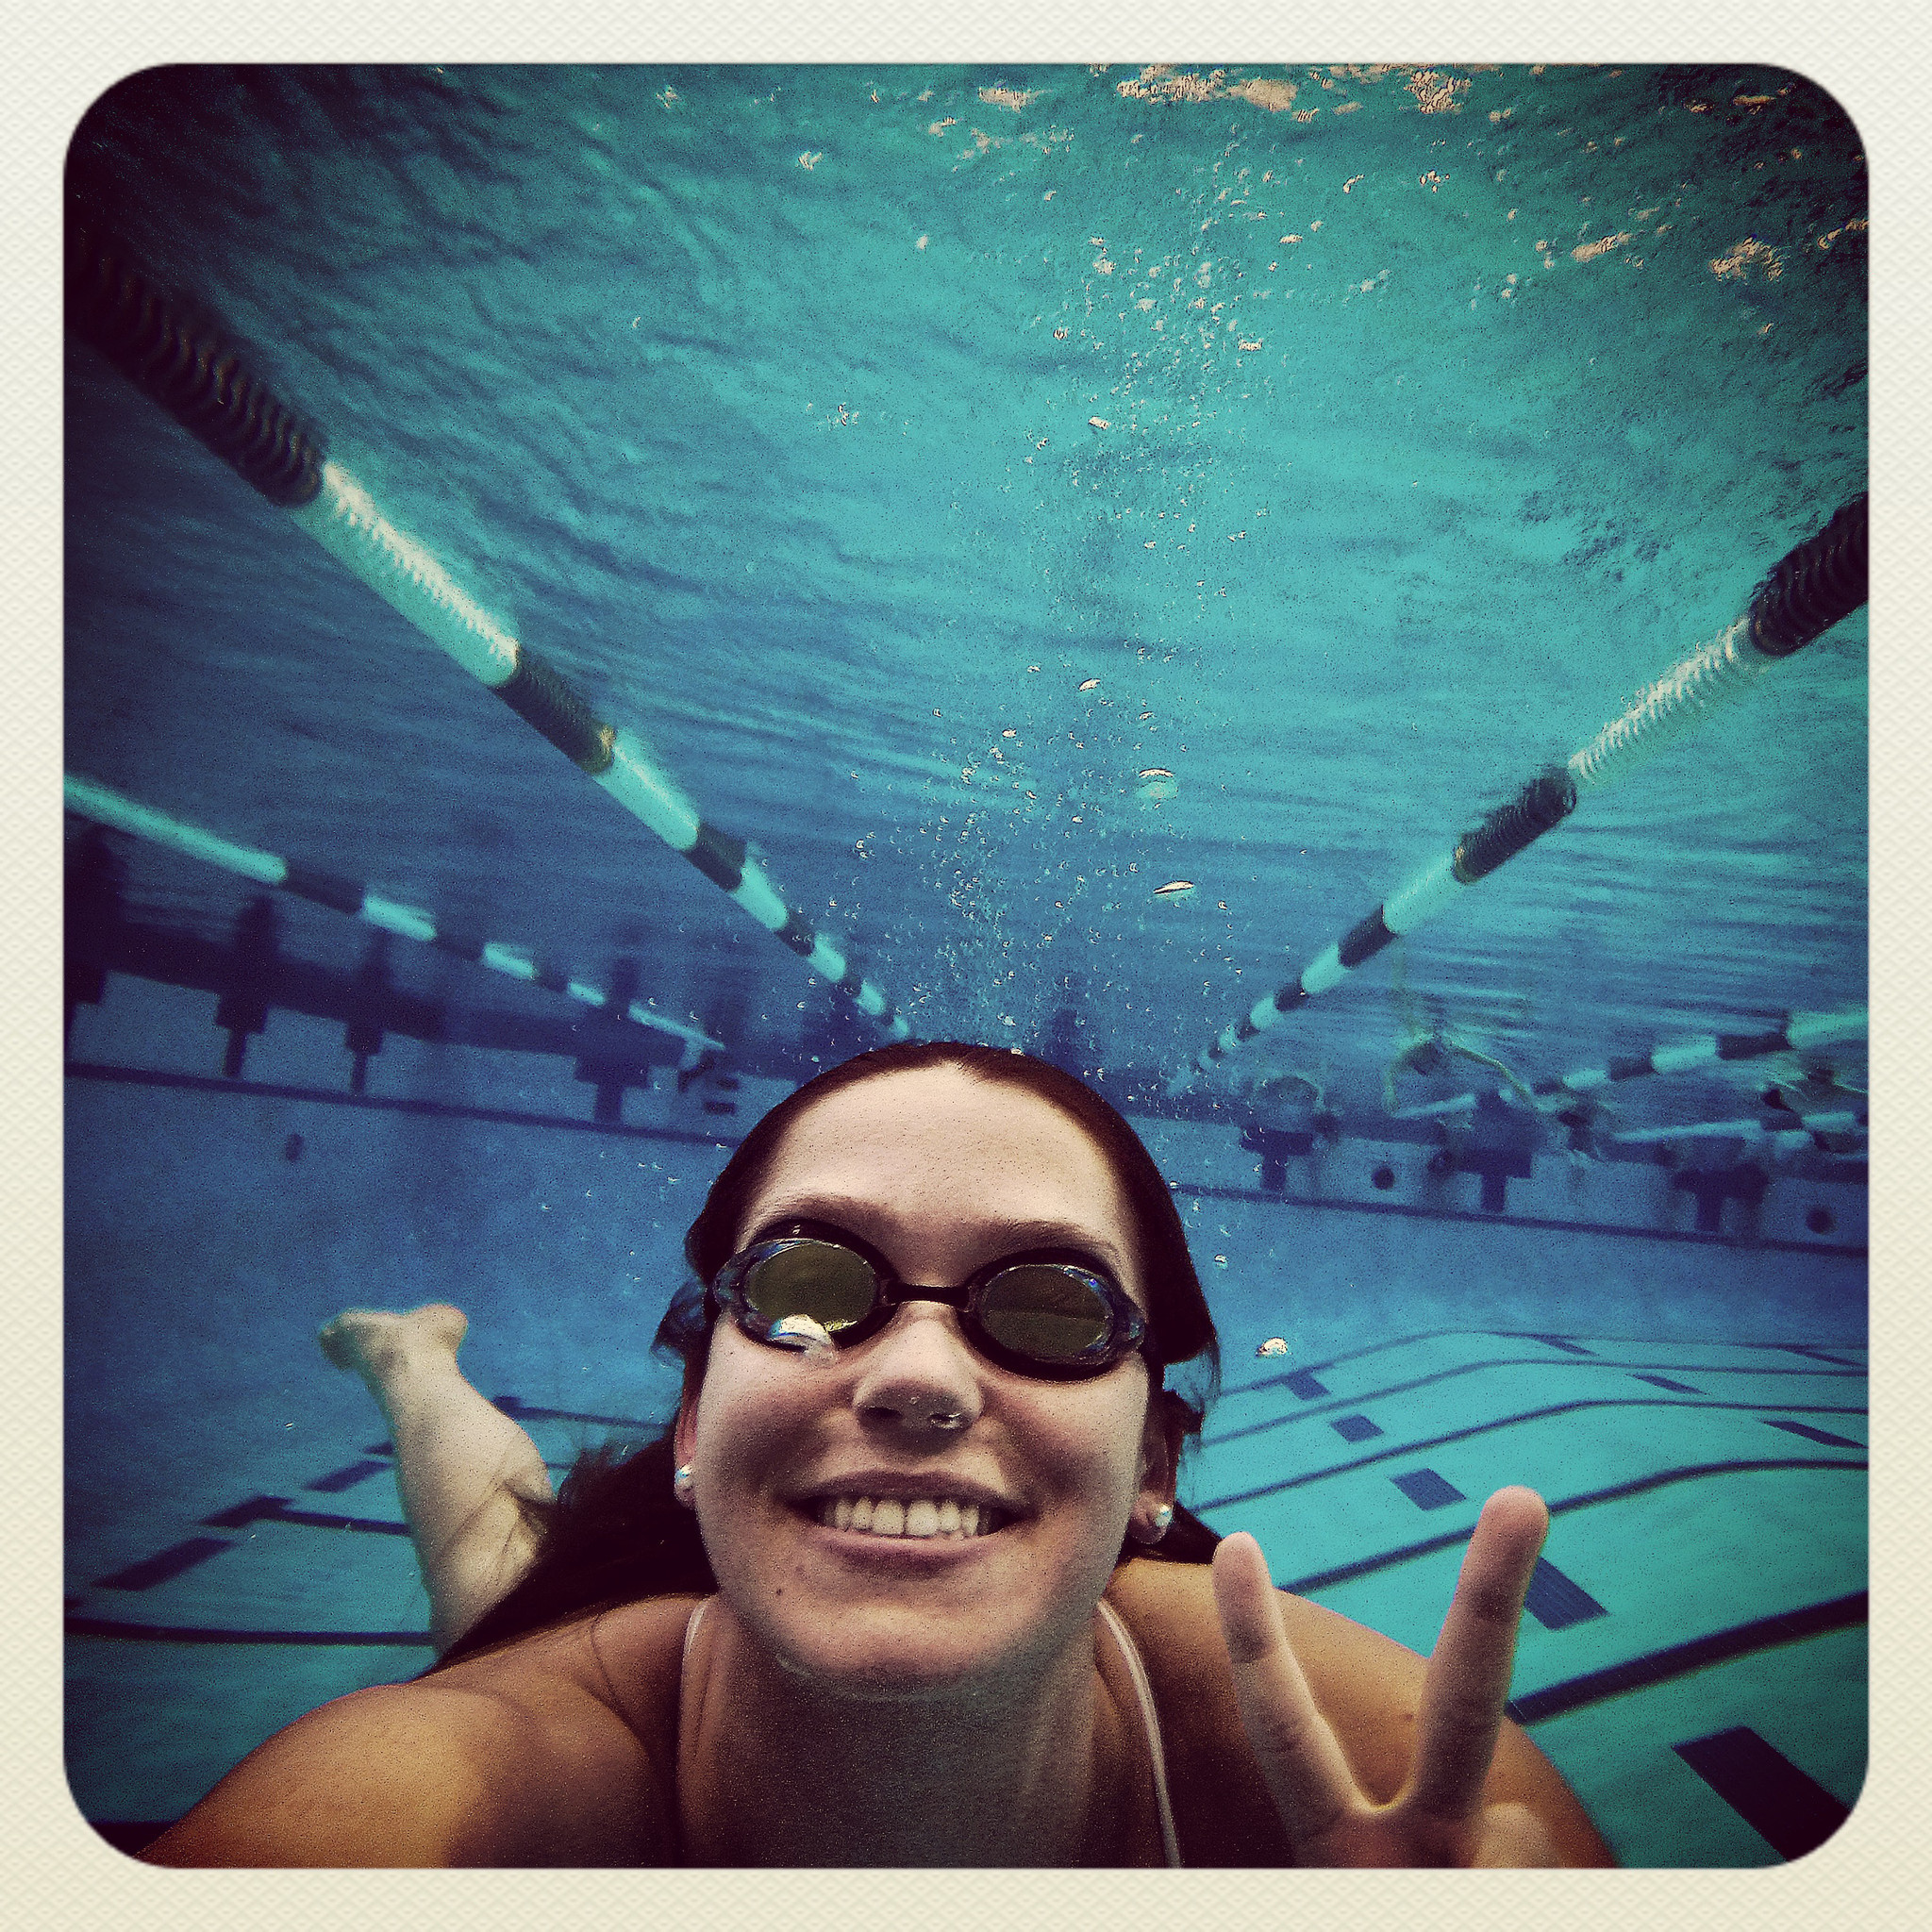 Dp-spt-olympics-uva-peyton-baldwin-leah-smith-swimming-0814-20160813